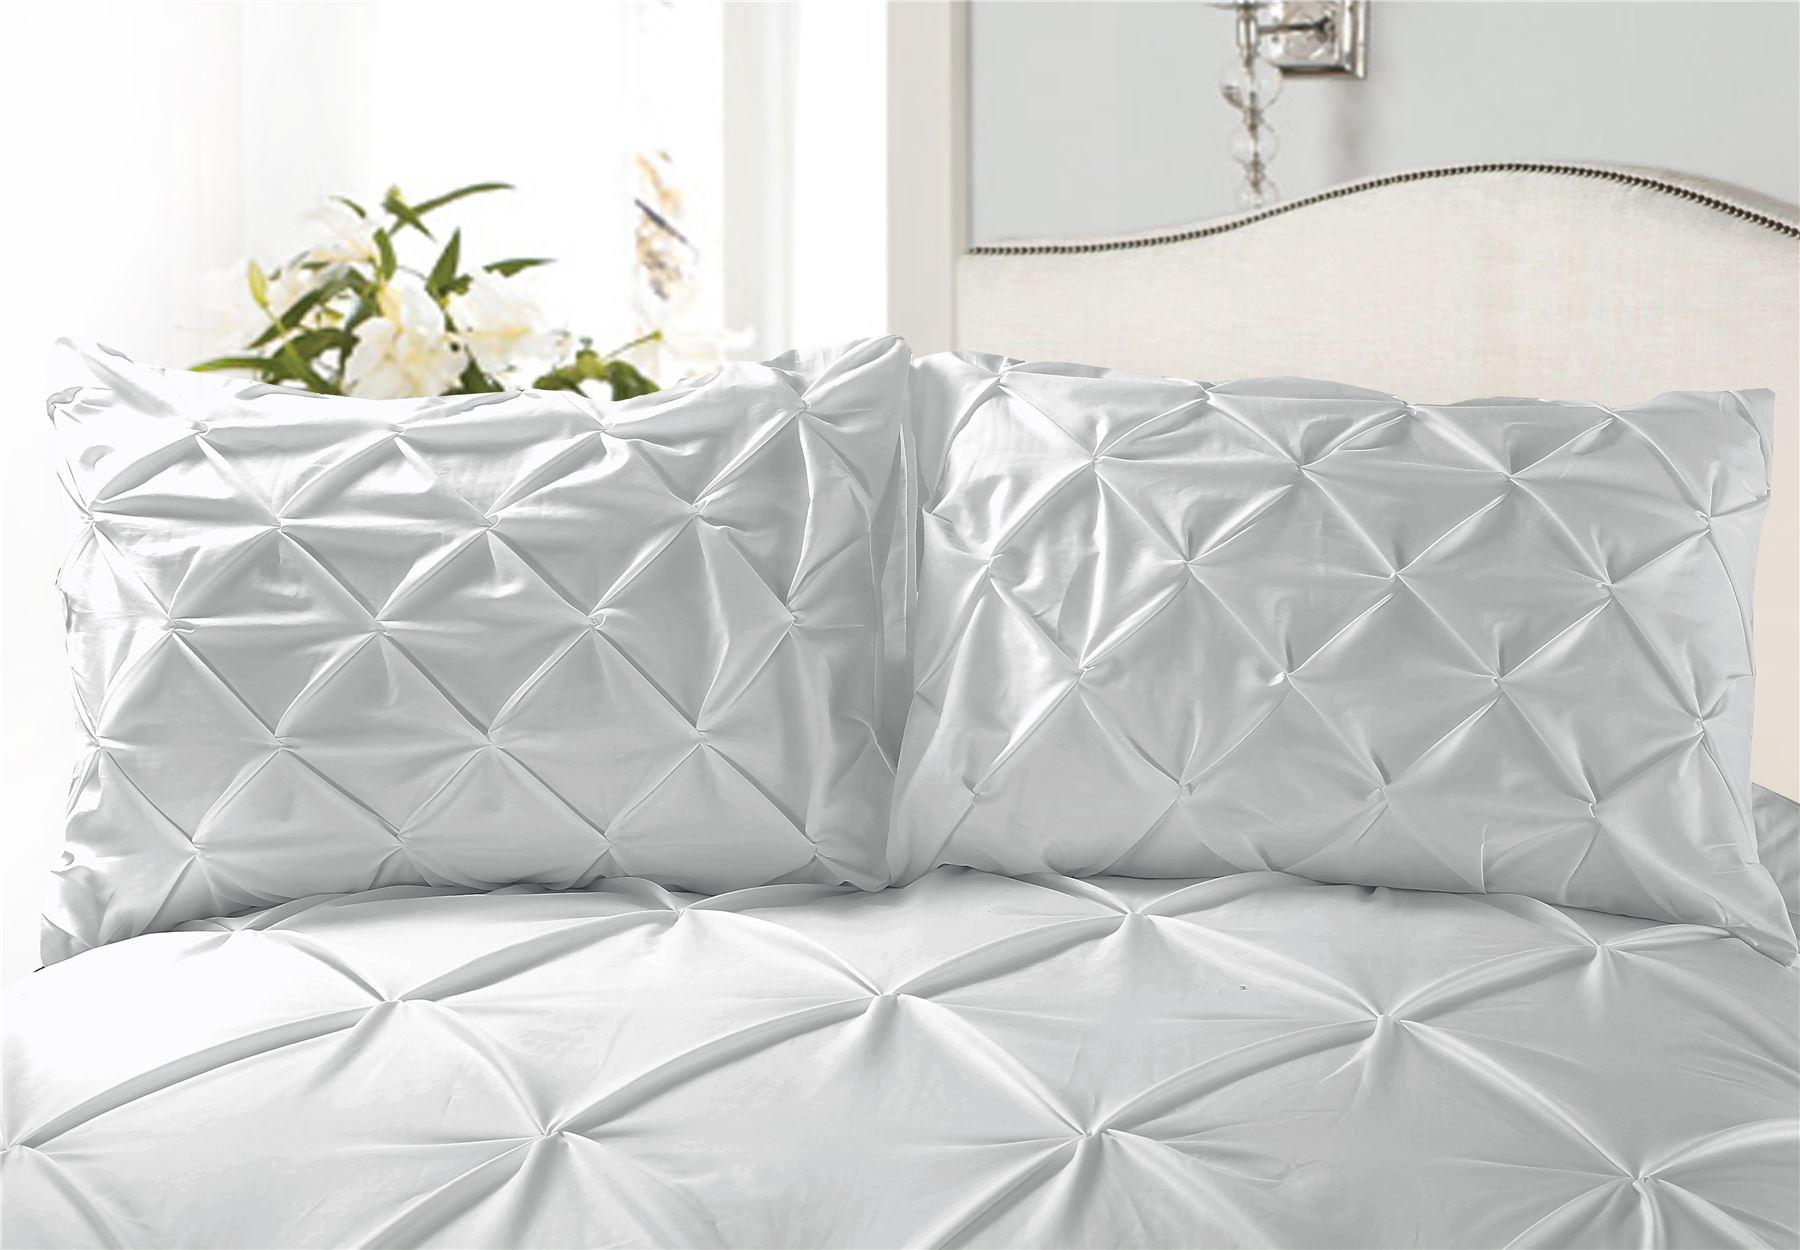 Luxury-Pure-100-Cotton-200-Thread-Pinch-Pleat-Pintuck-Puckering-Duvet-Cover-Set thumbnail 44